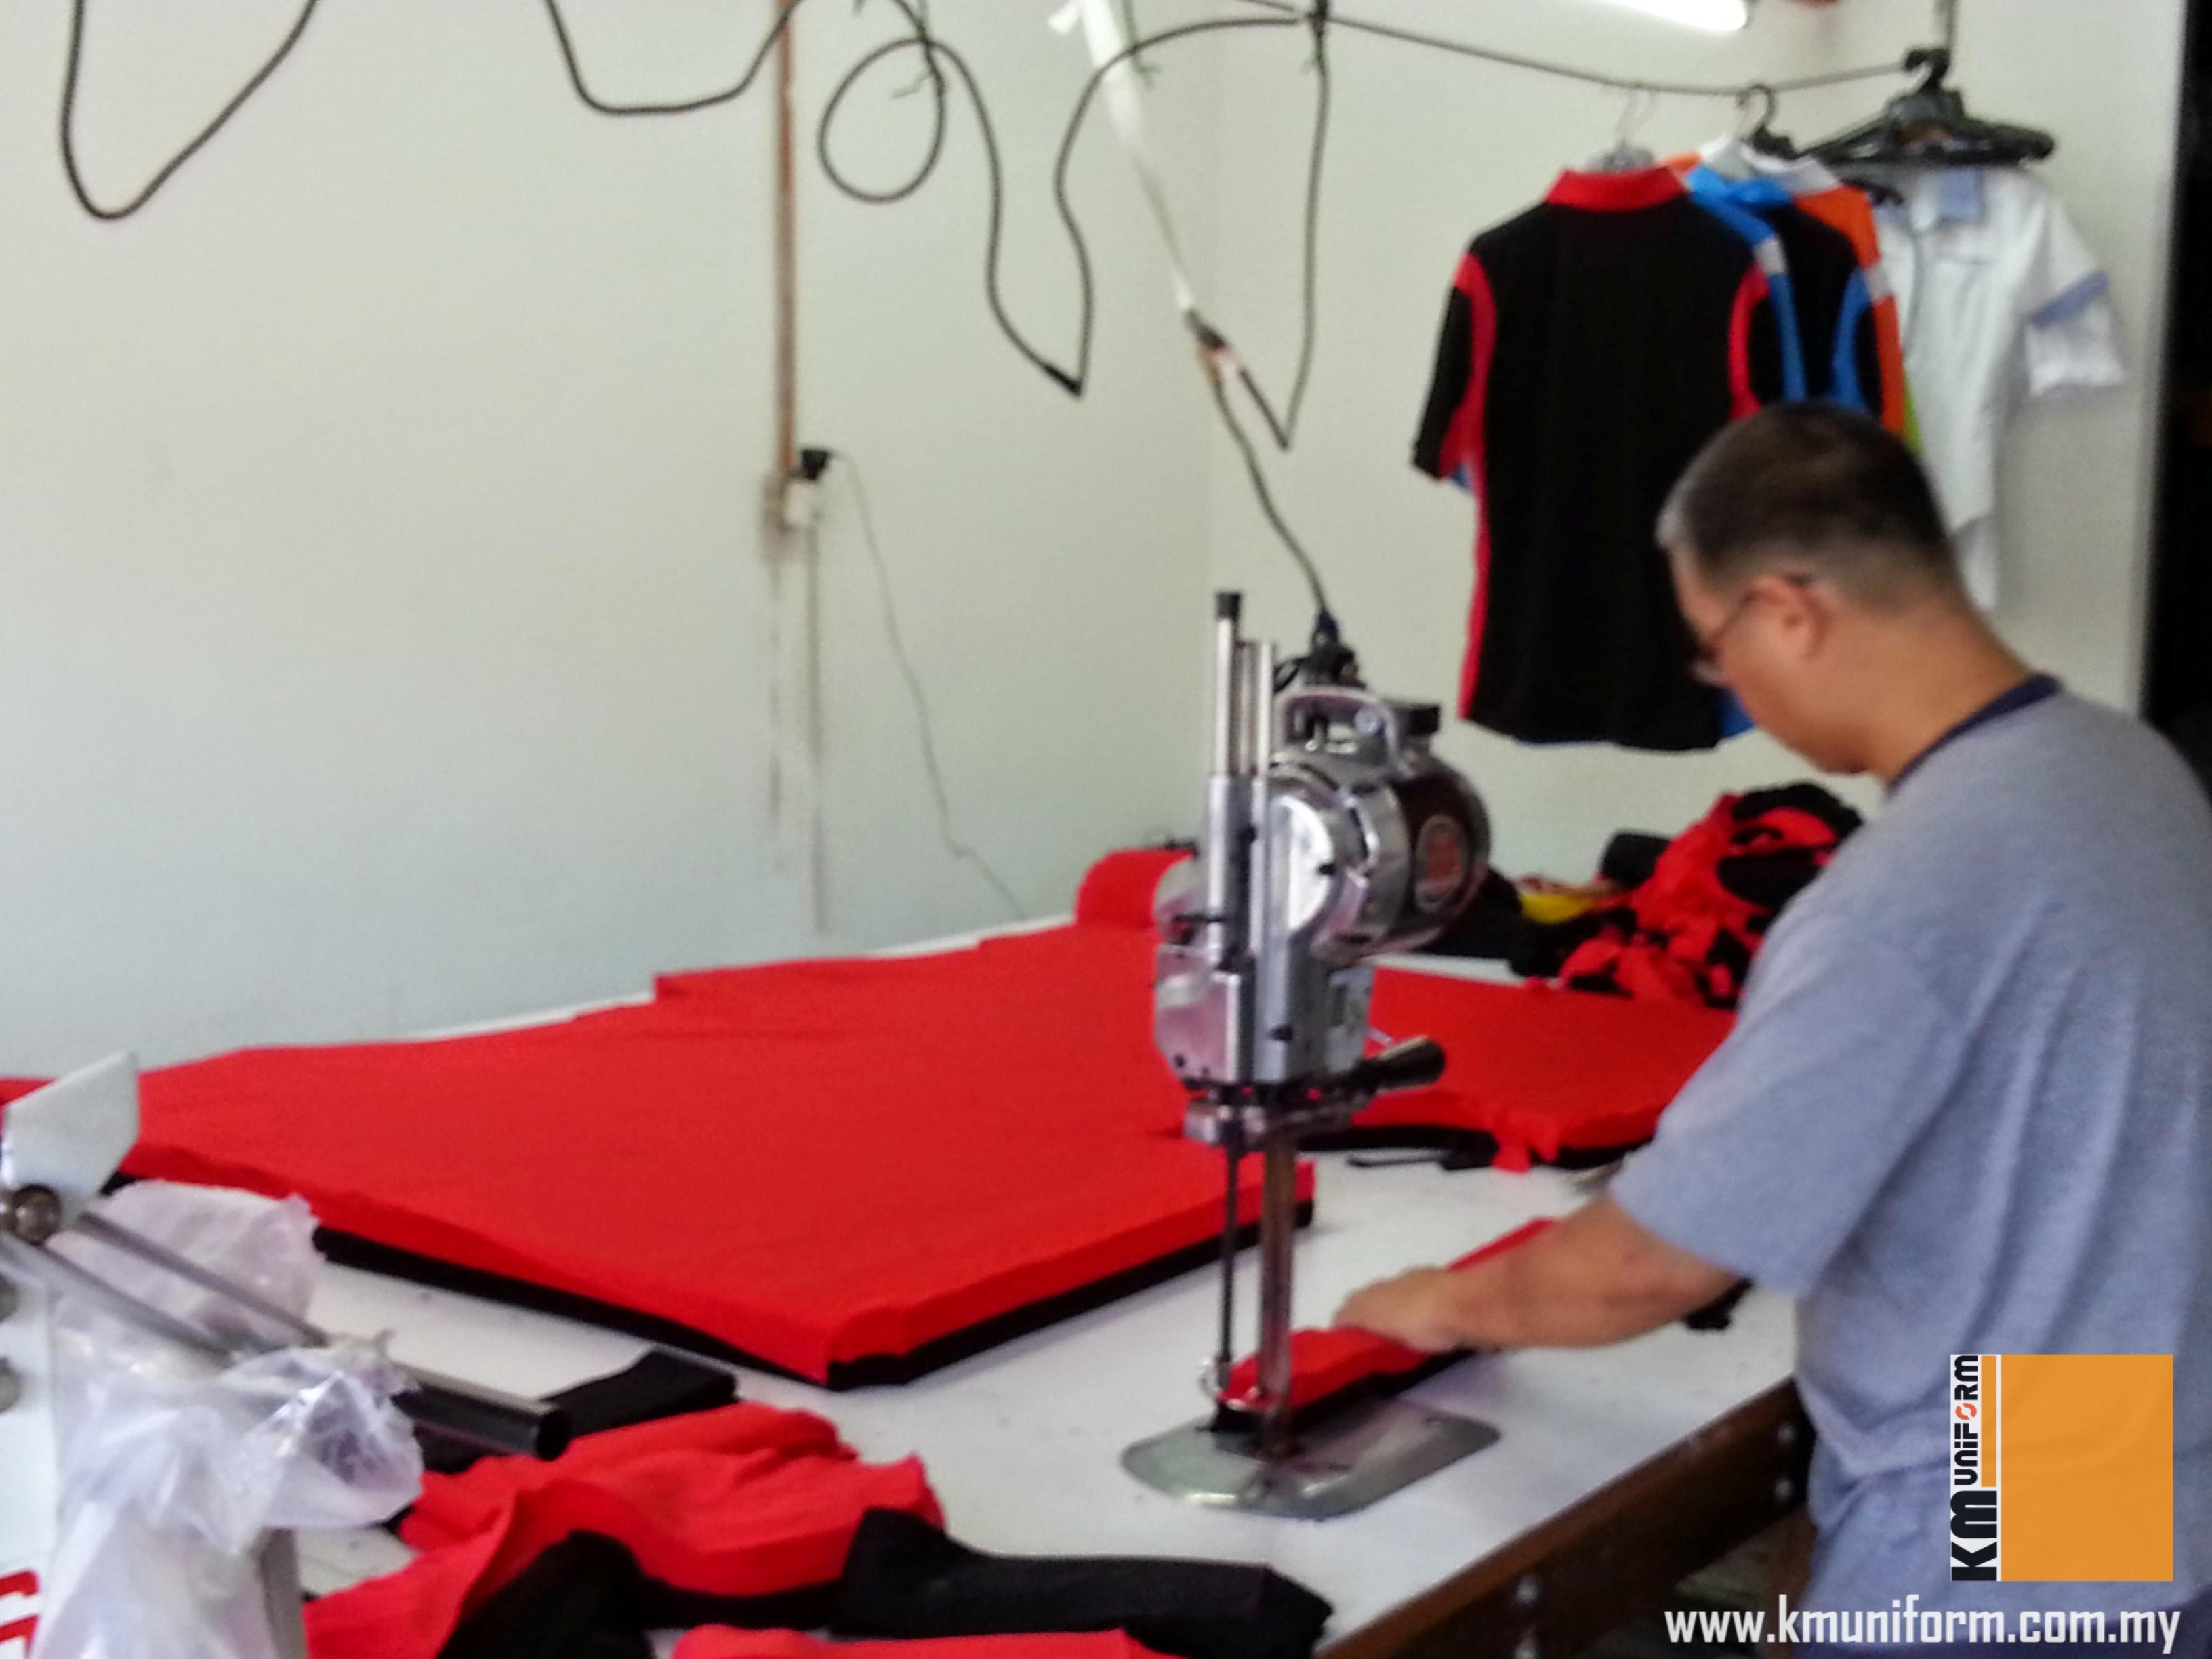 Design t shirt johor - Design T Shirt Johor 46